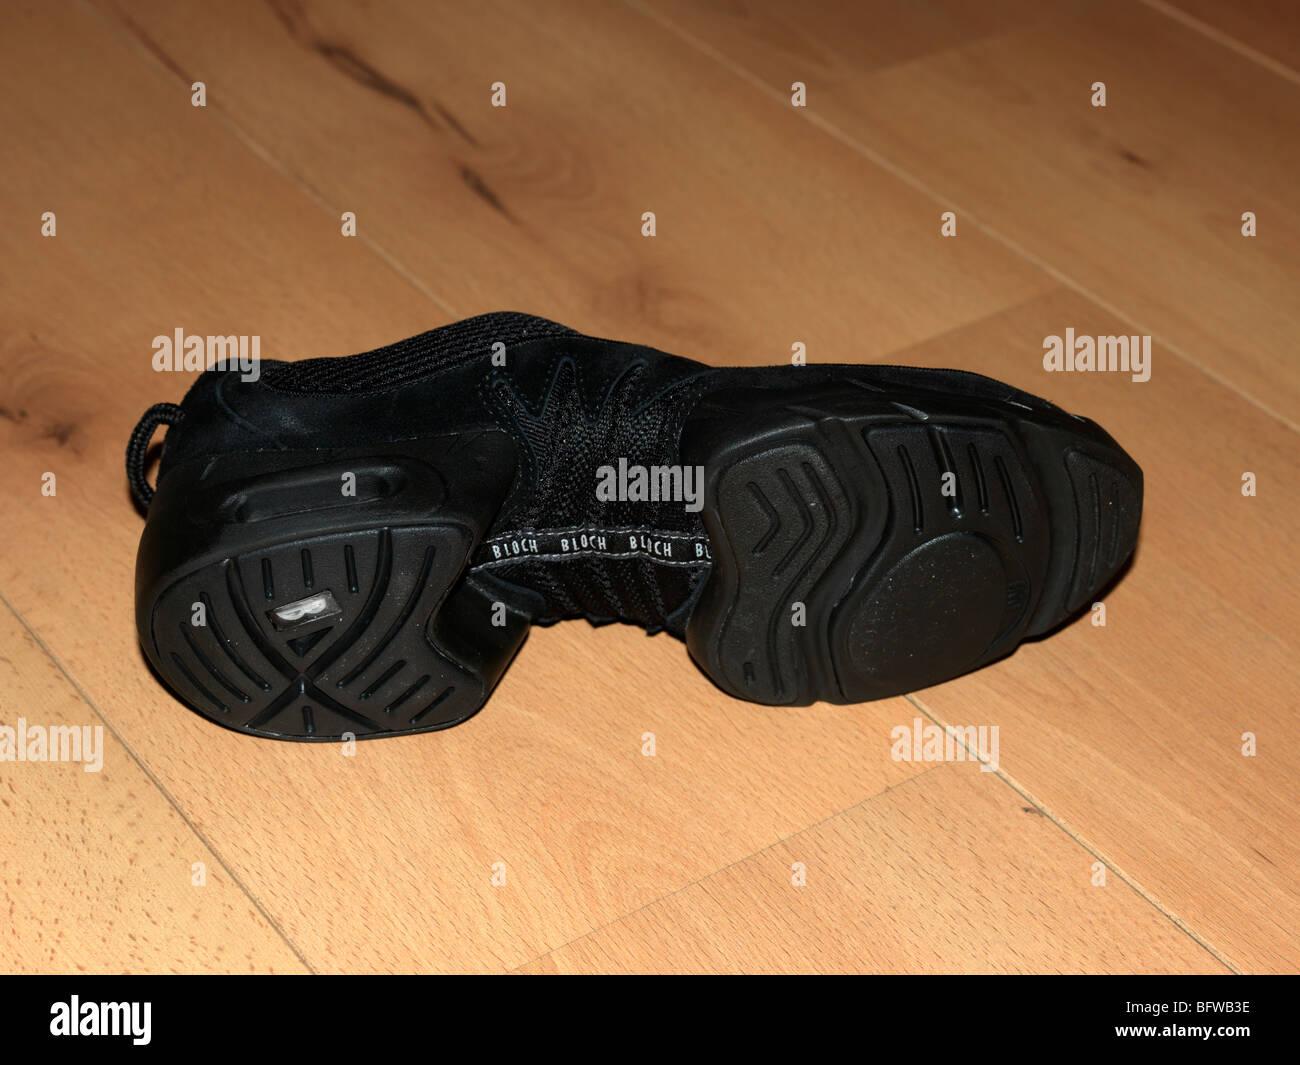 Split Toe Dance Trainer - Stock Image